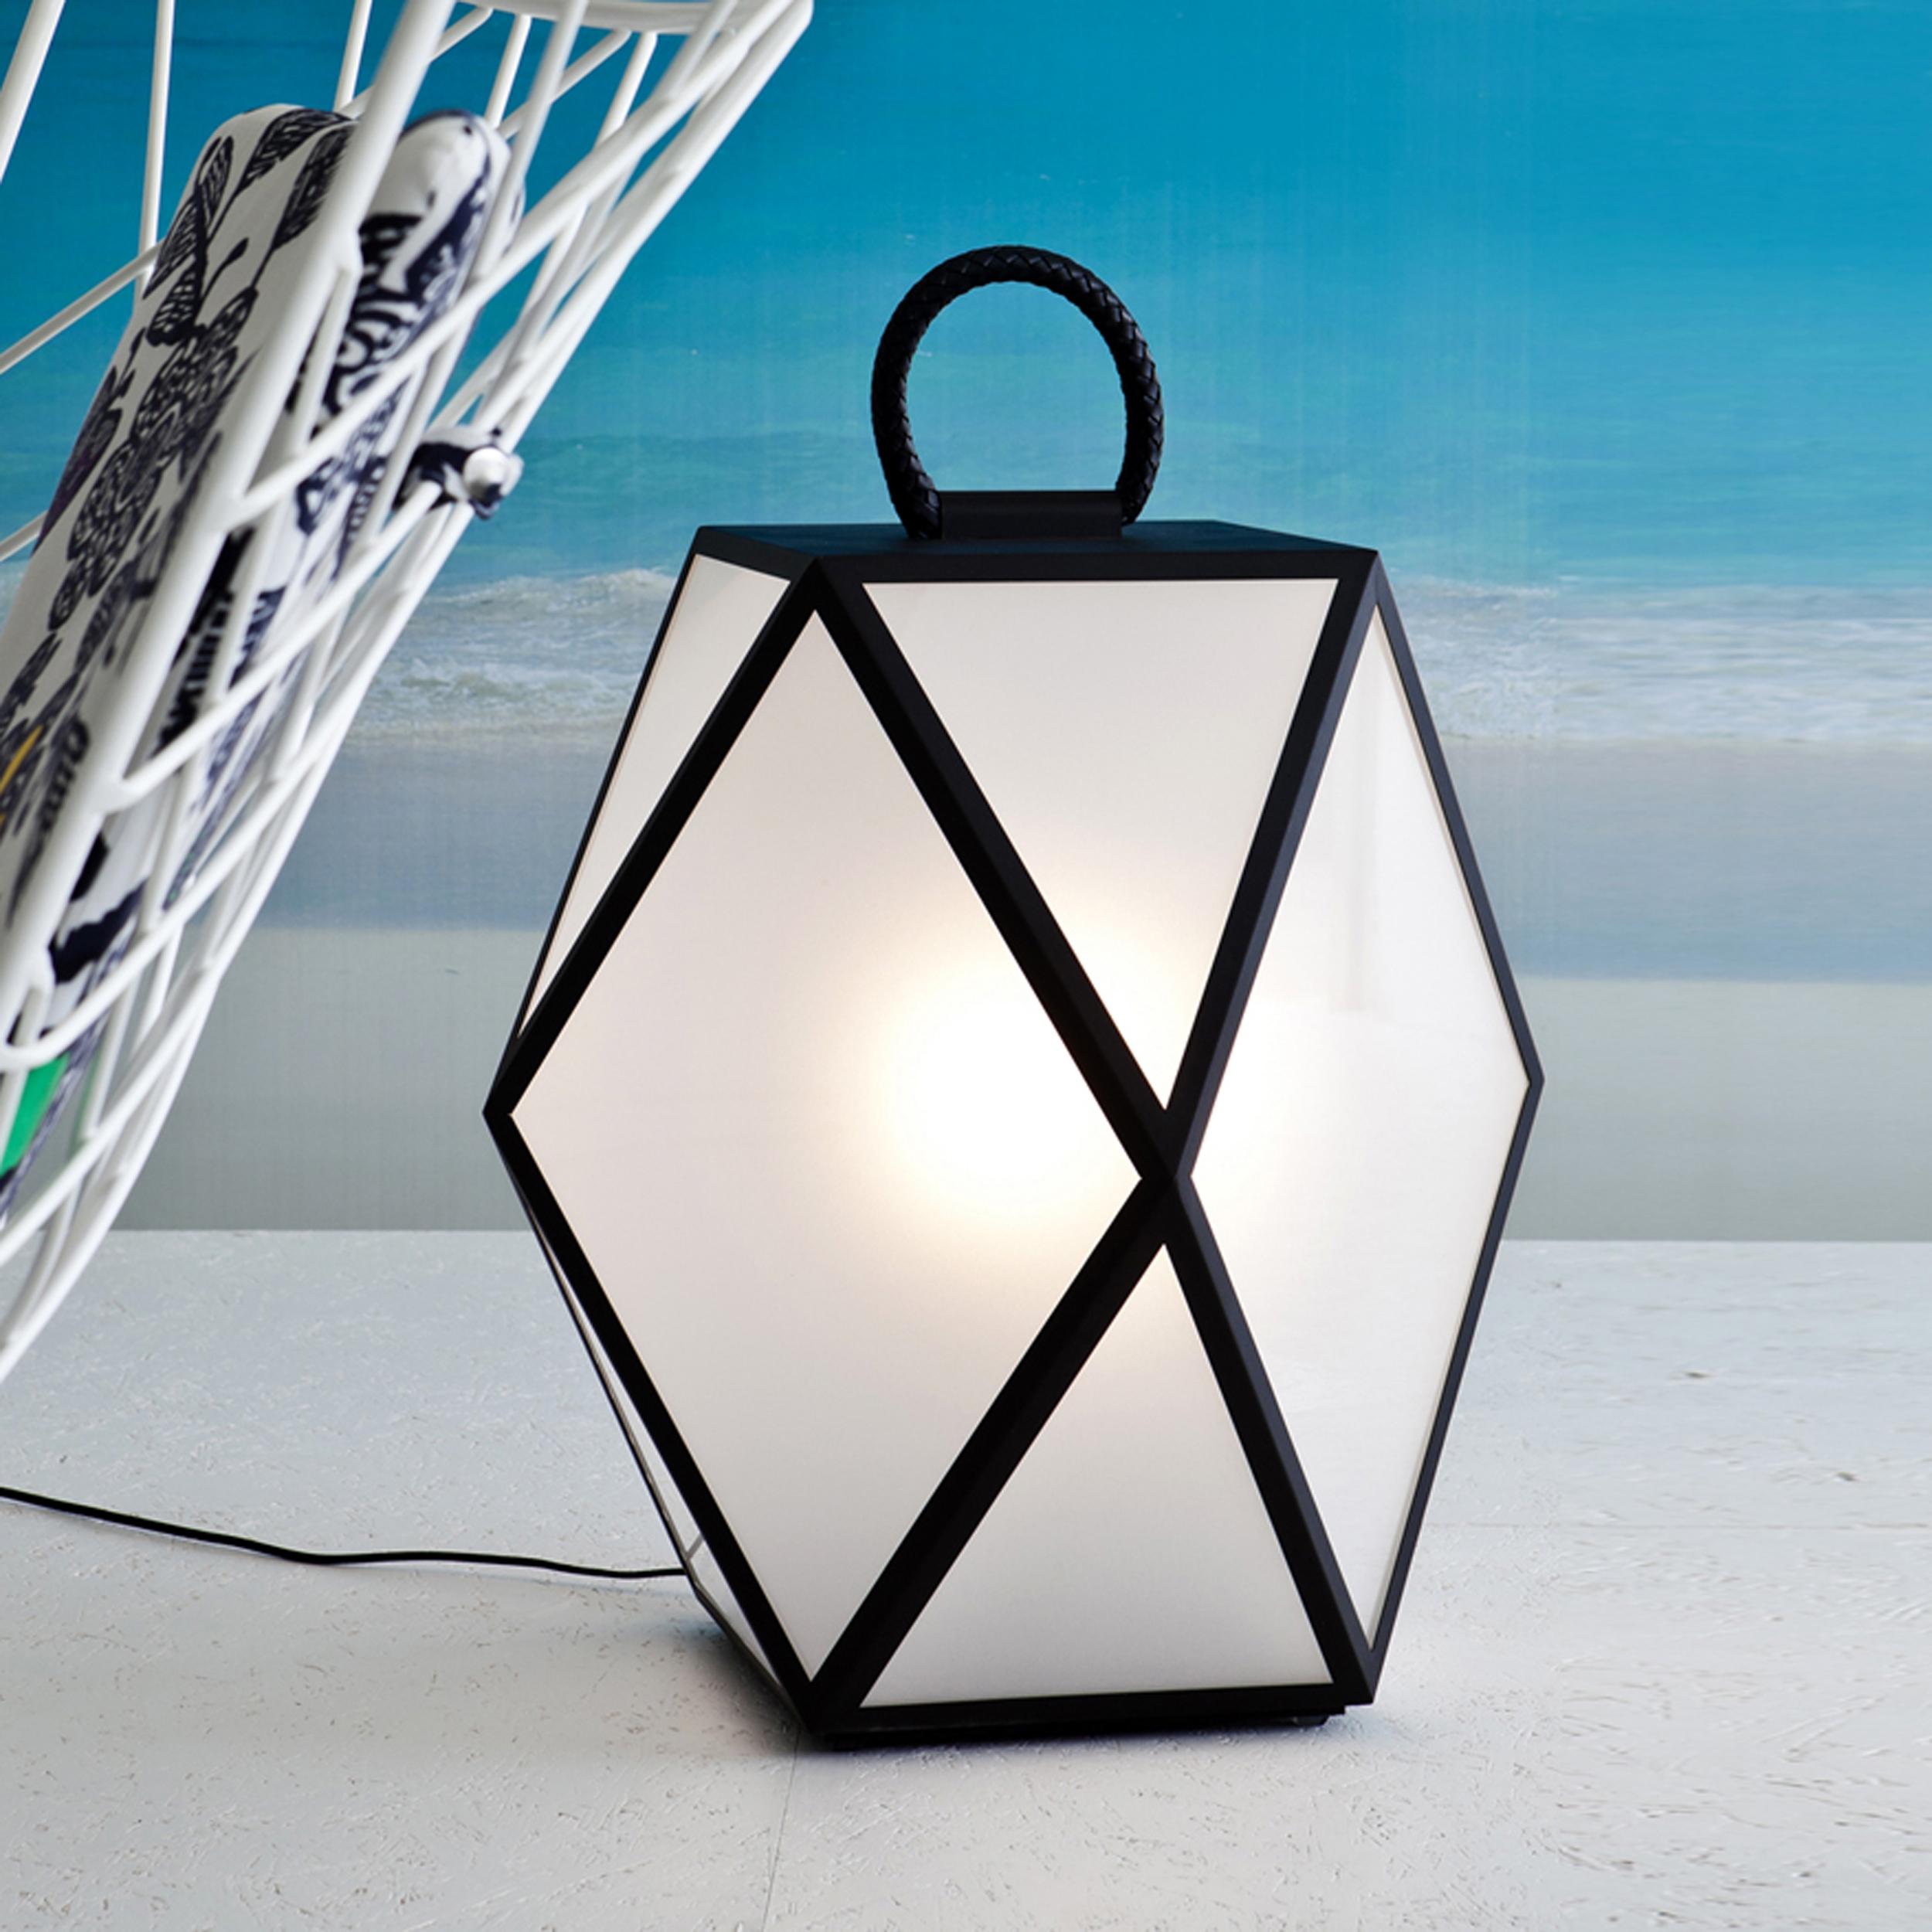 Contardi Muse Large Outdoor Floor Lamp Black C